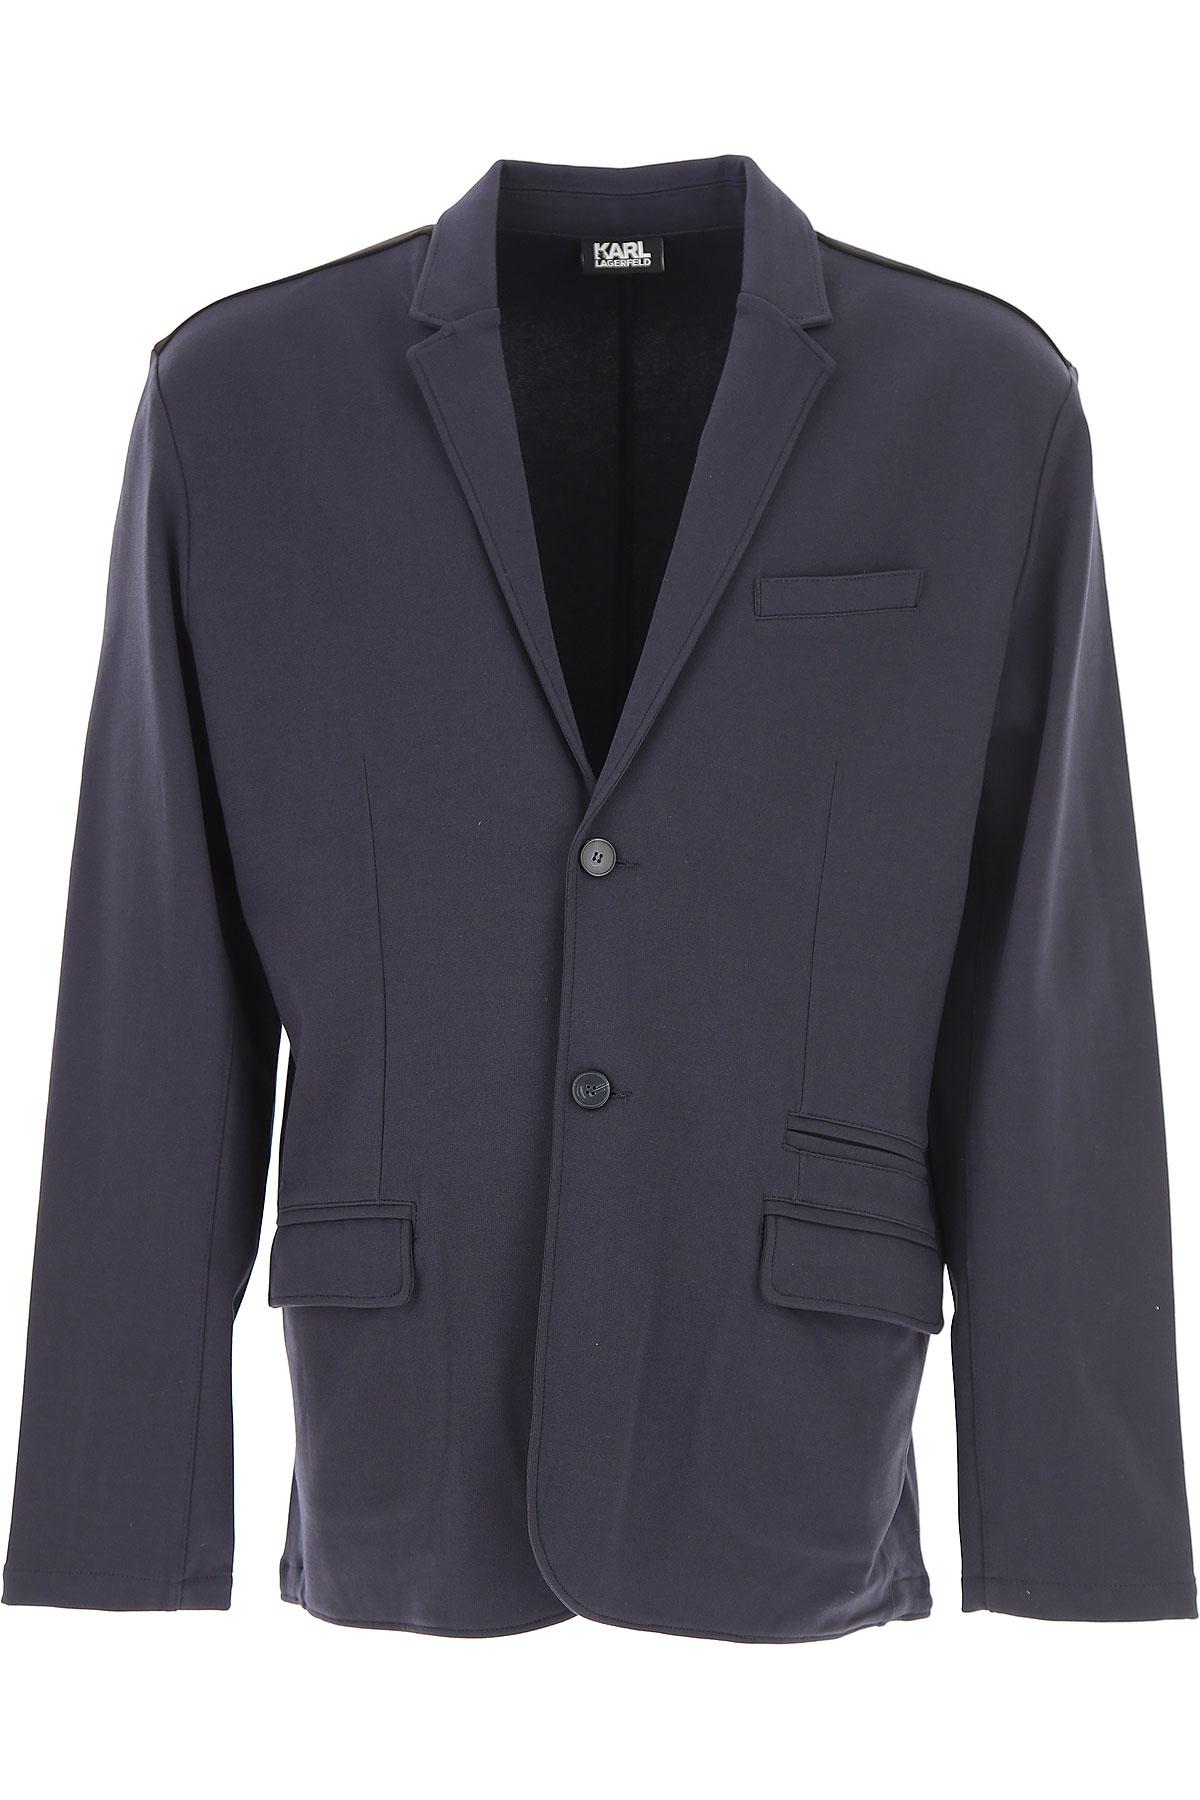 Image of Karl Lagerfeld Blazer for Men, Sport Coat, Dark Blue, Viscose, 2017, L M S XL XXL